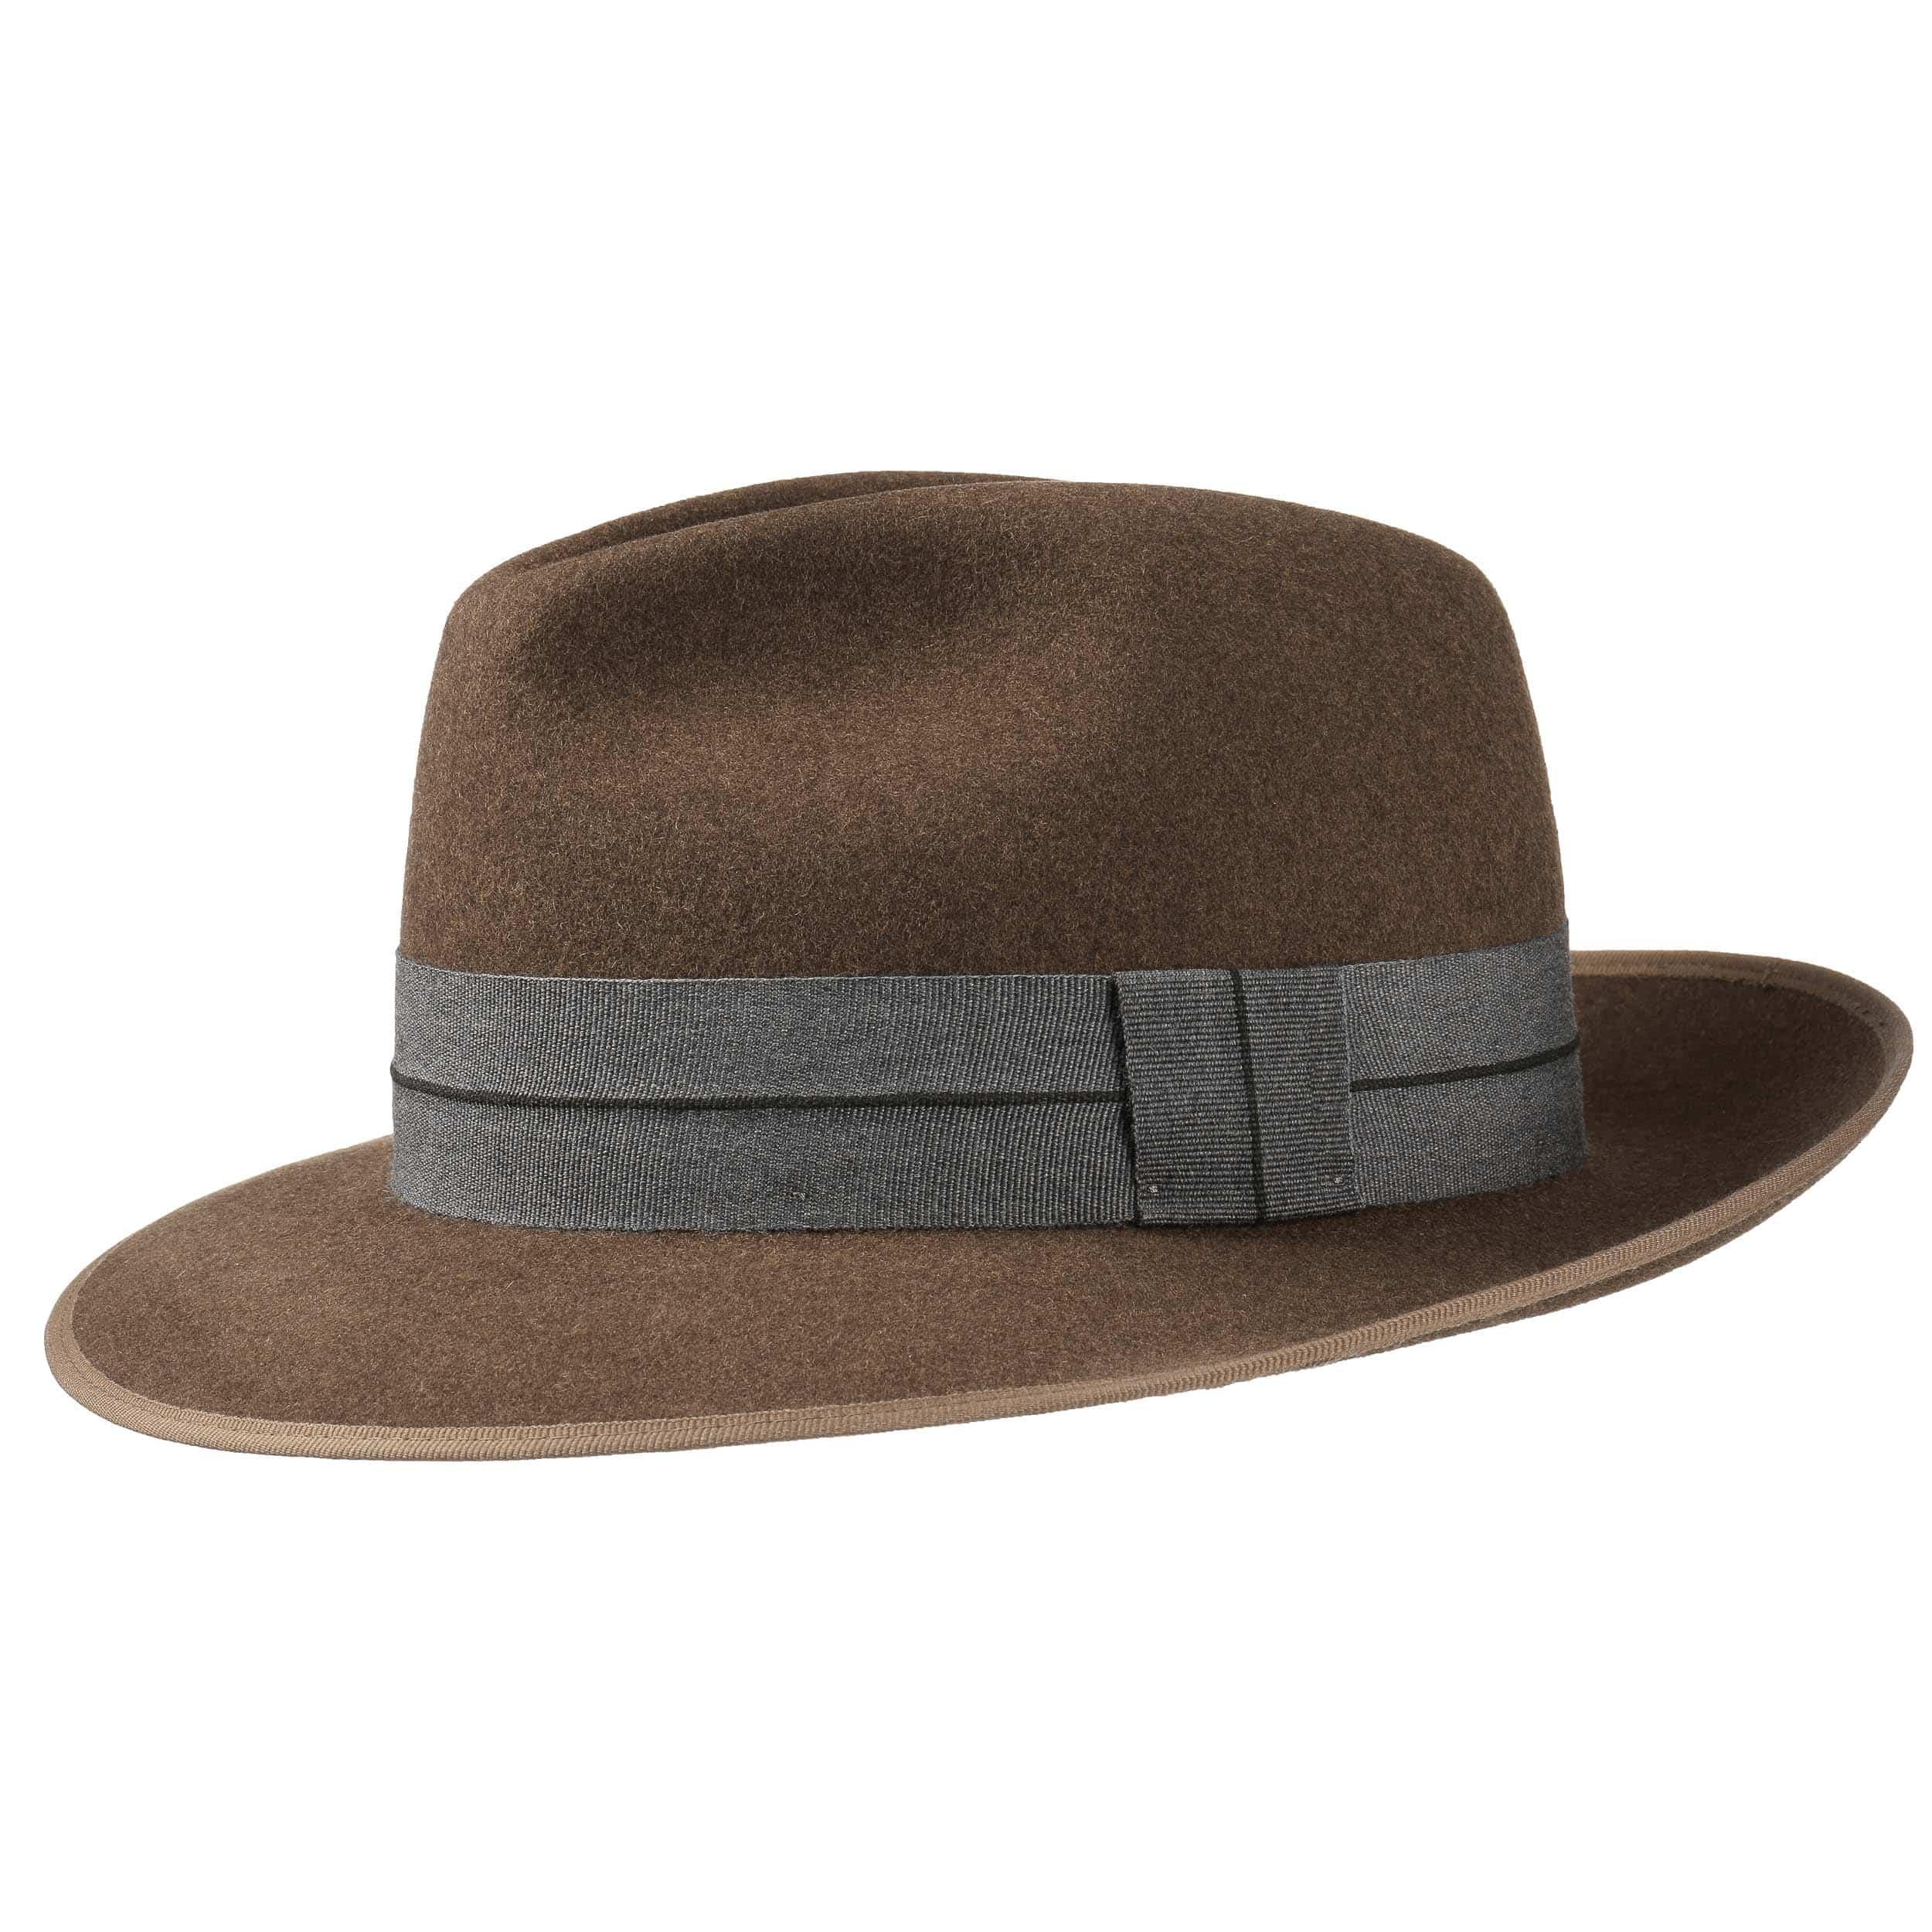 Sombrero Fieltro Lana Virgi by Stetson - Sombreros - sombreroshop.es e6d84426fb8